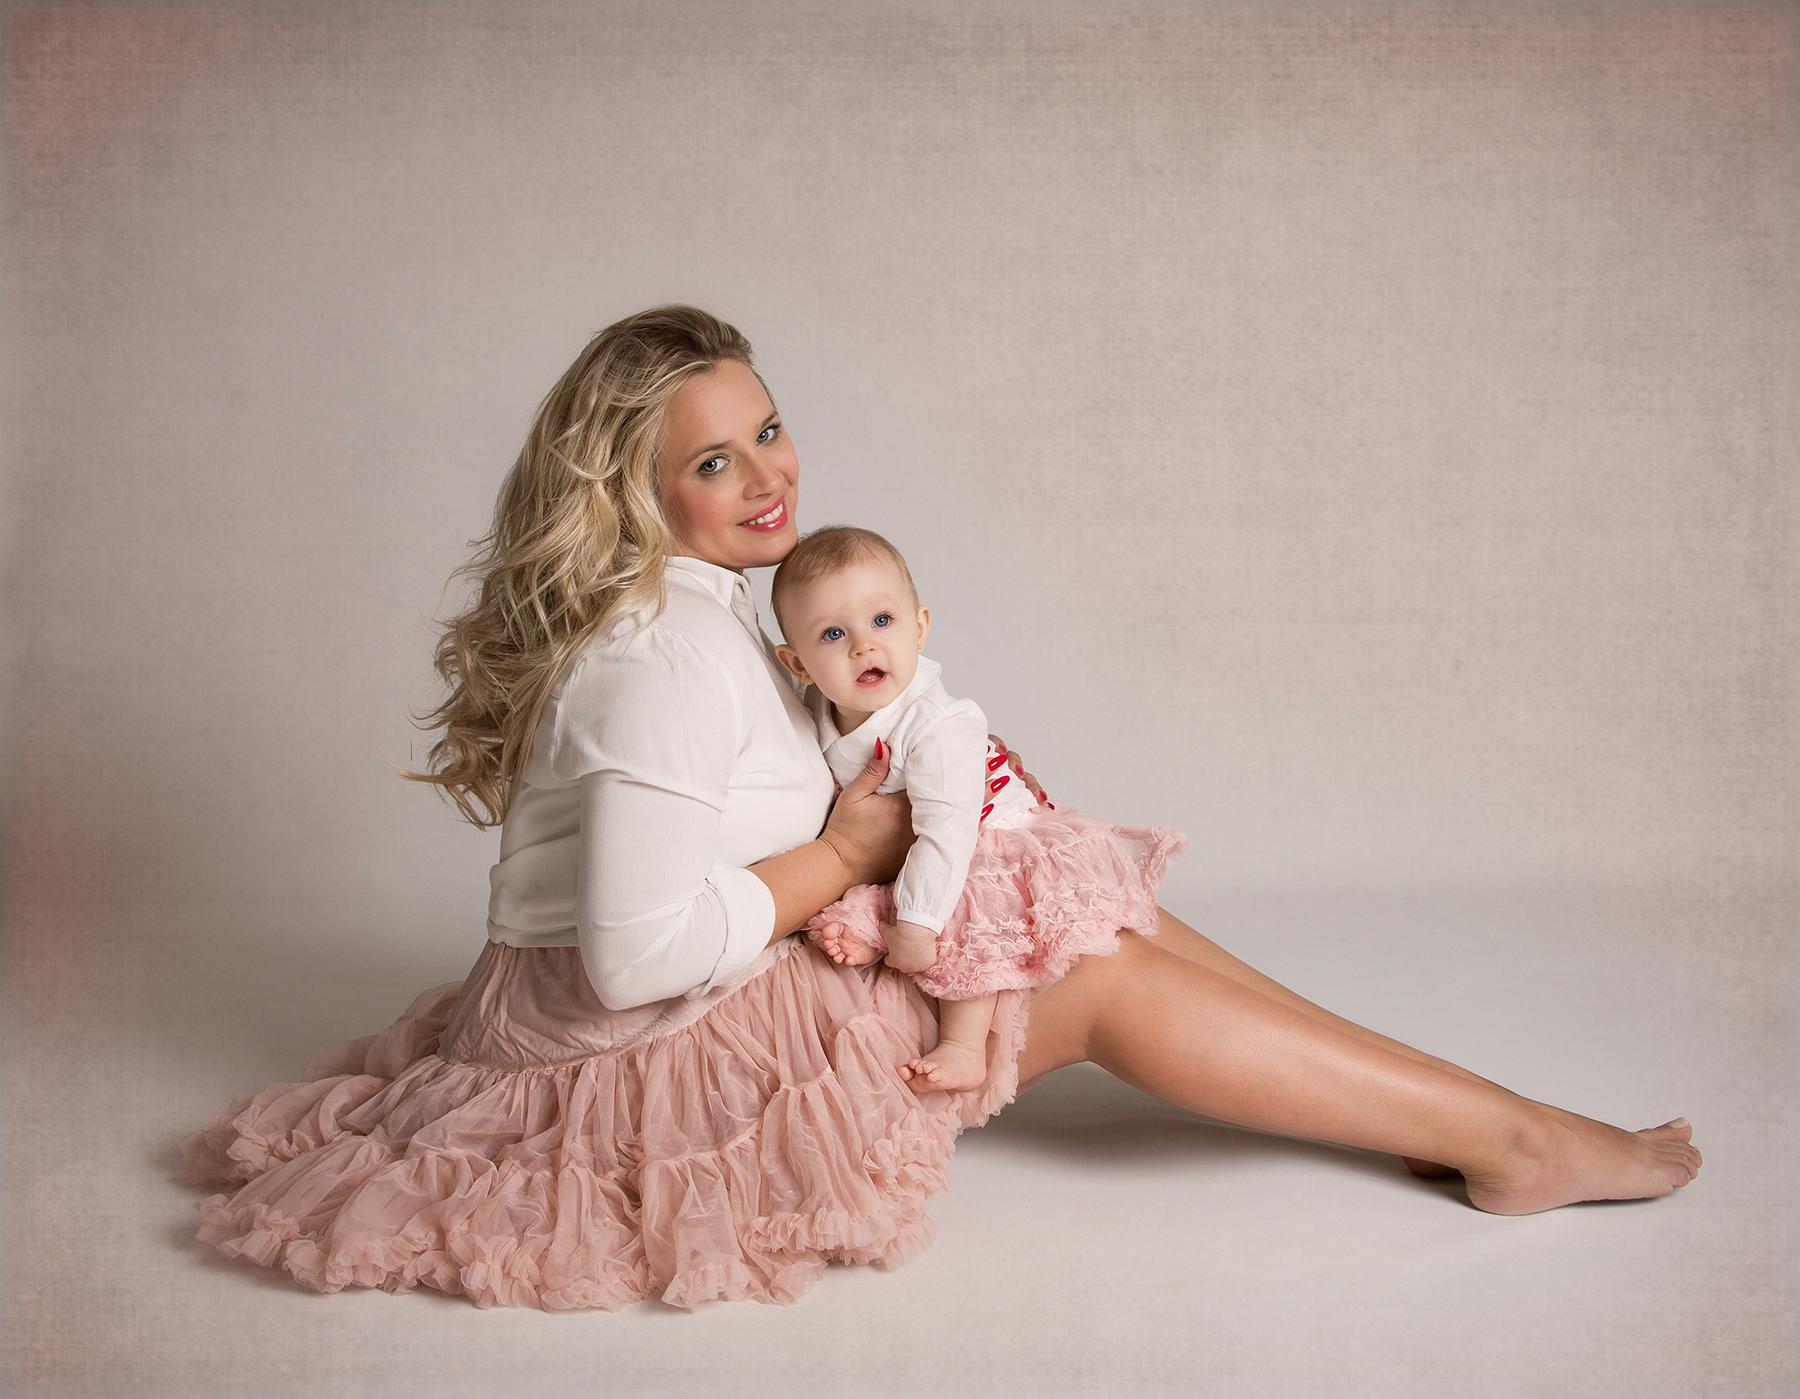 7c9689b29 Fotos especiales para el Día de la Madre + Paula + Vanesa + Fotos de estudio  para bebés + Silvia Ferrer.